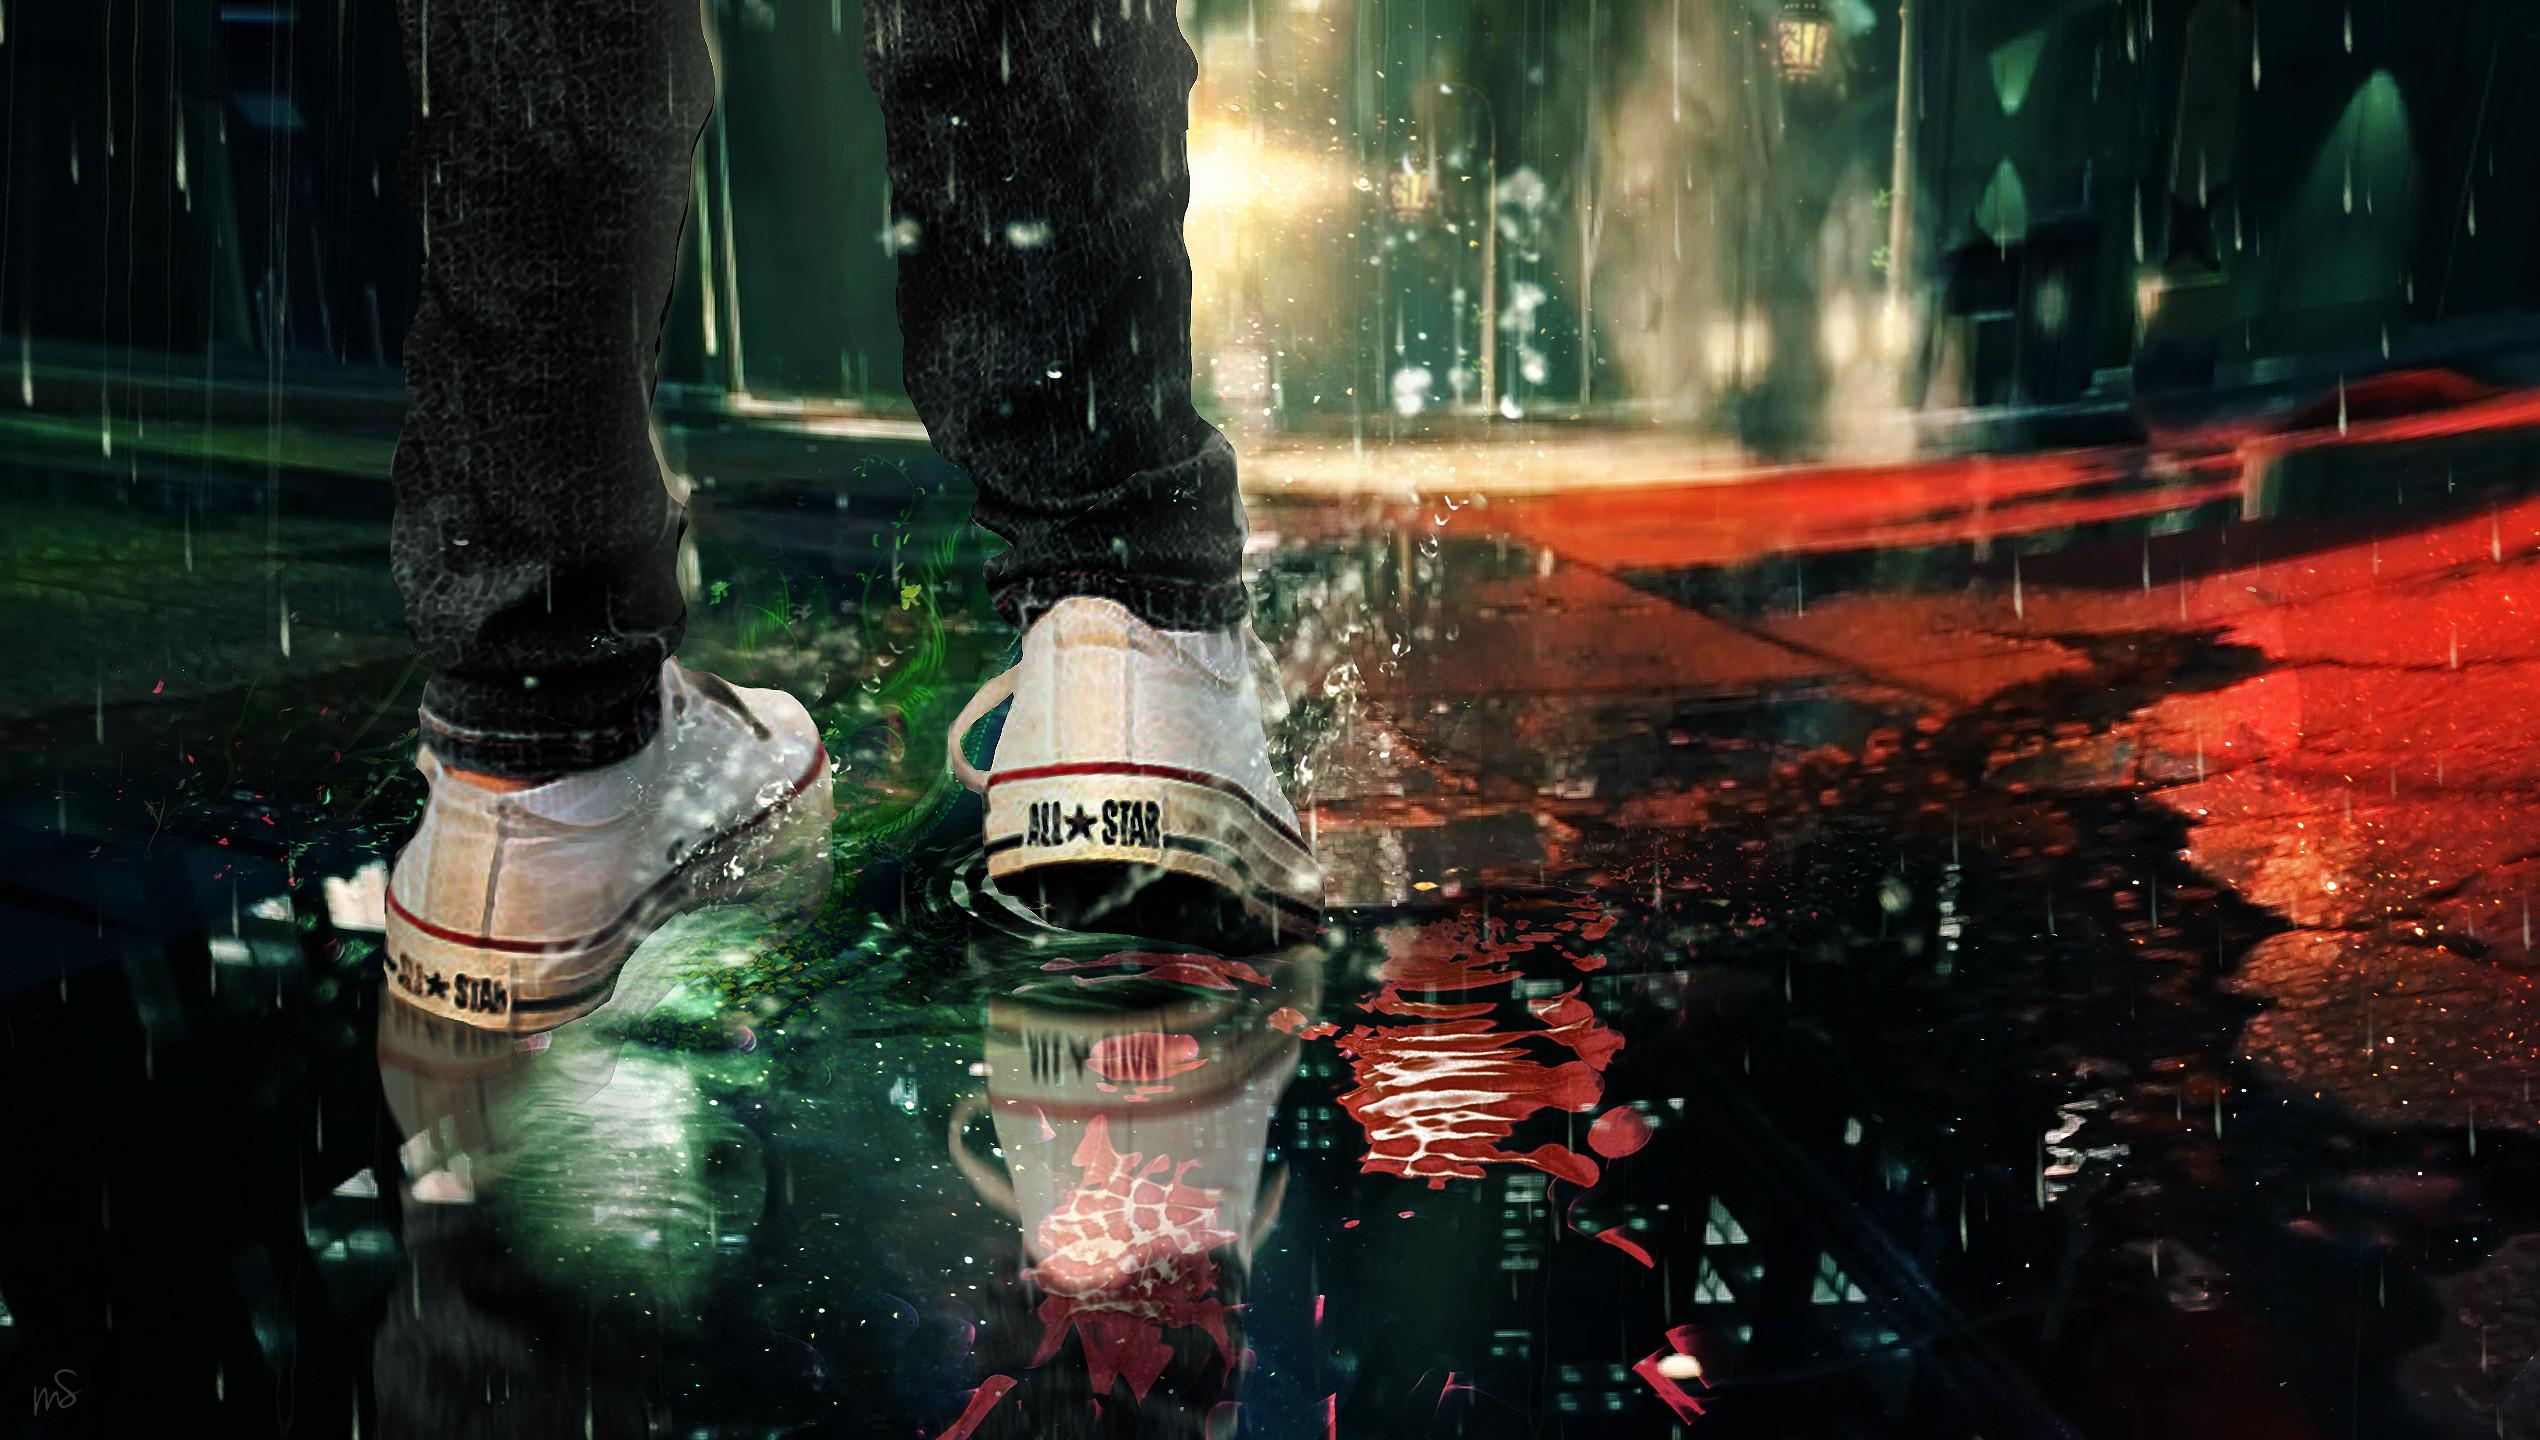 Rain Drops HD Wallpapers Rain Pinterest | HD Wallpapers | Pinterest | Rain  drops, Hd wallpaper and Wallpaper